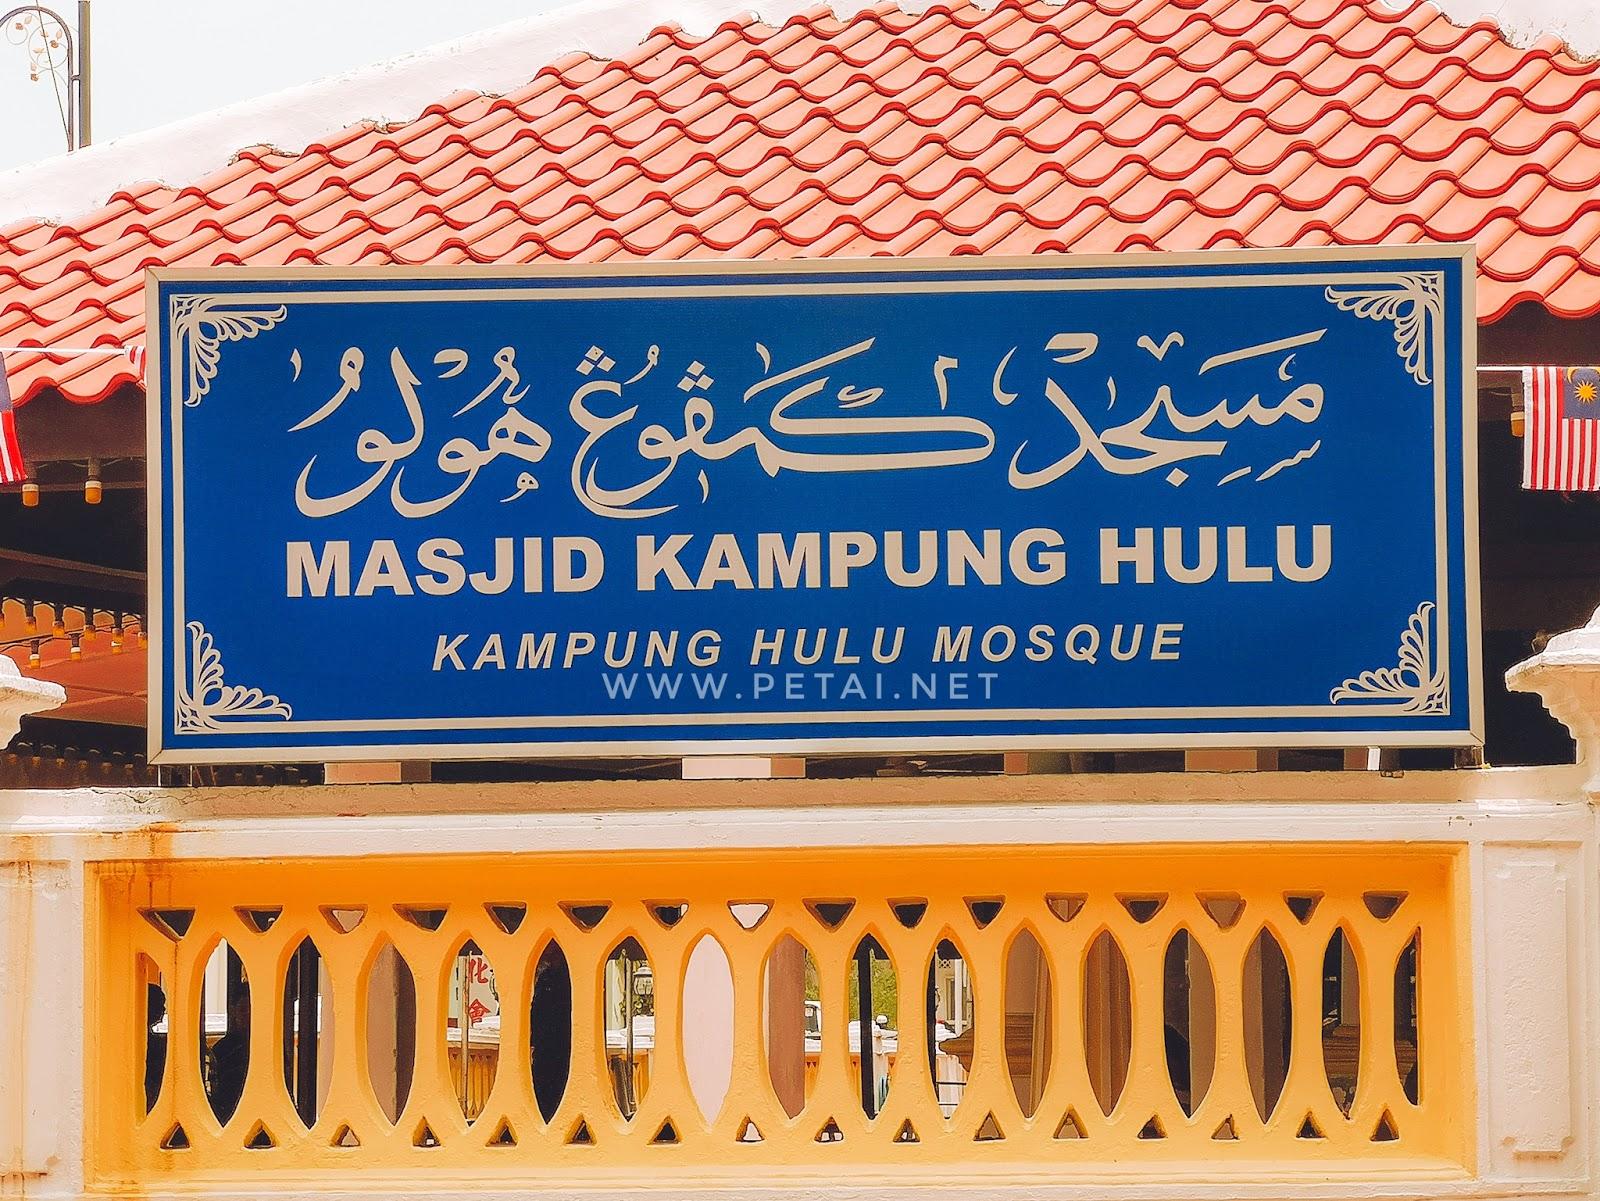 Masjid Kampung Hulu, Melaka - signboard